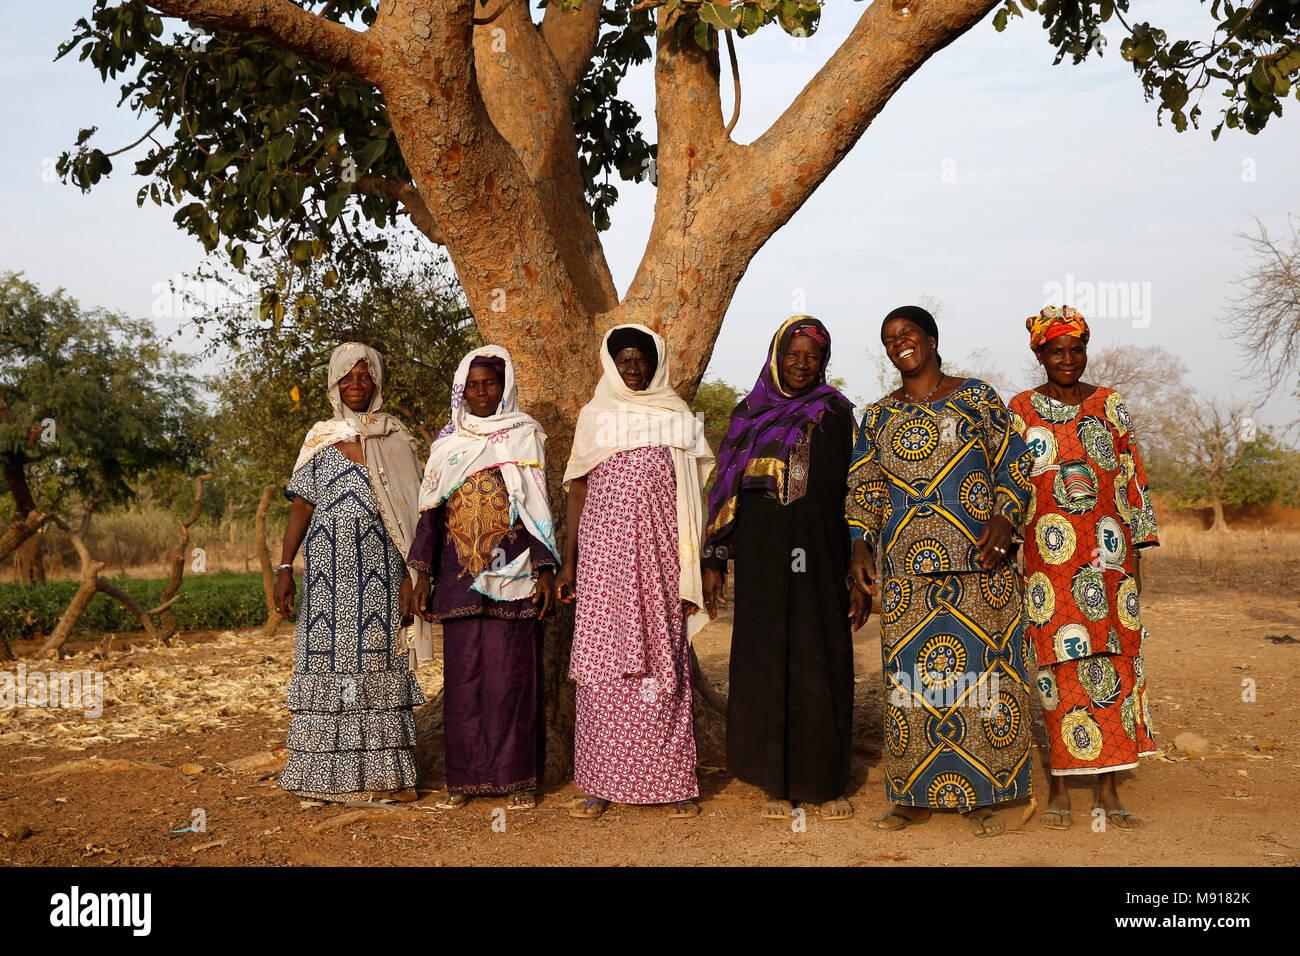 UBTEC NGO in a village near Ouahigouya, Burkina Faso. Members of a microfinance cooperative. - Stock Image